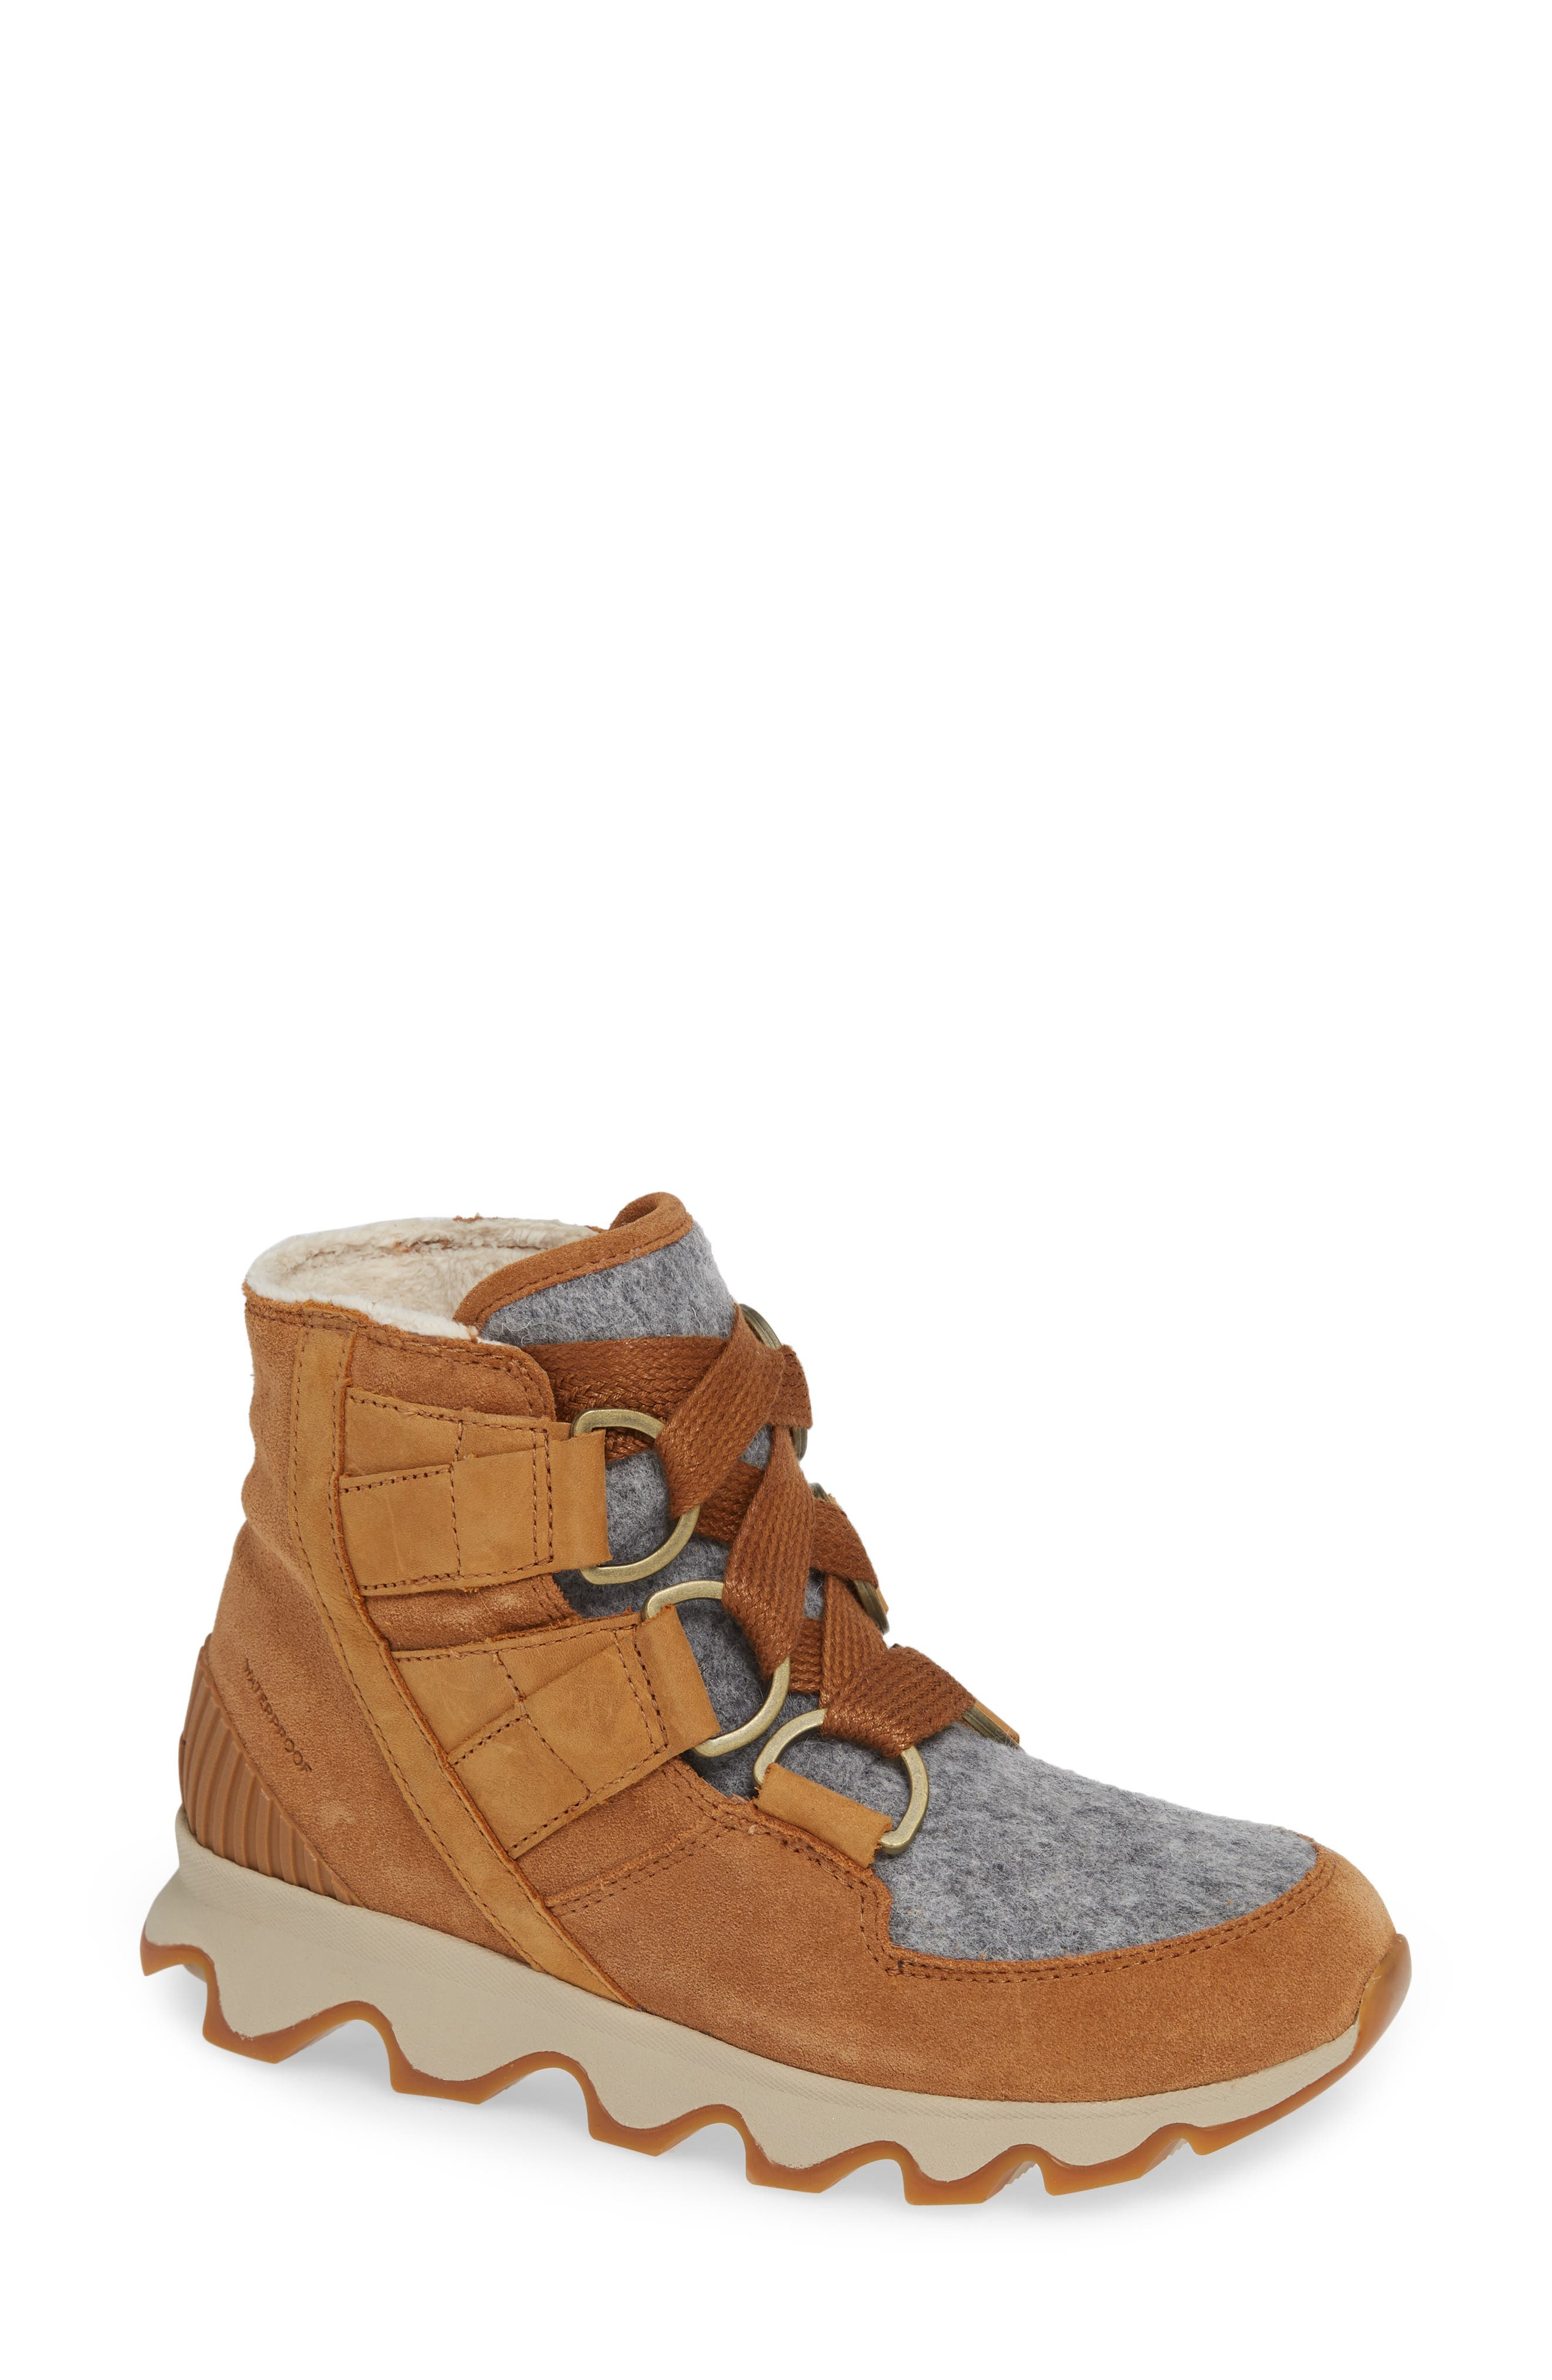 Kinetic Waterproof Short Lace-Up Boot,                             Main thumbnail 1, color,                             CAMEL BROWN